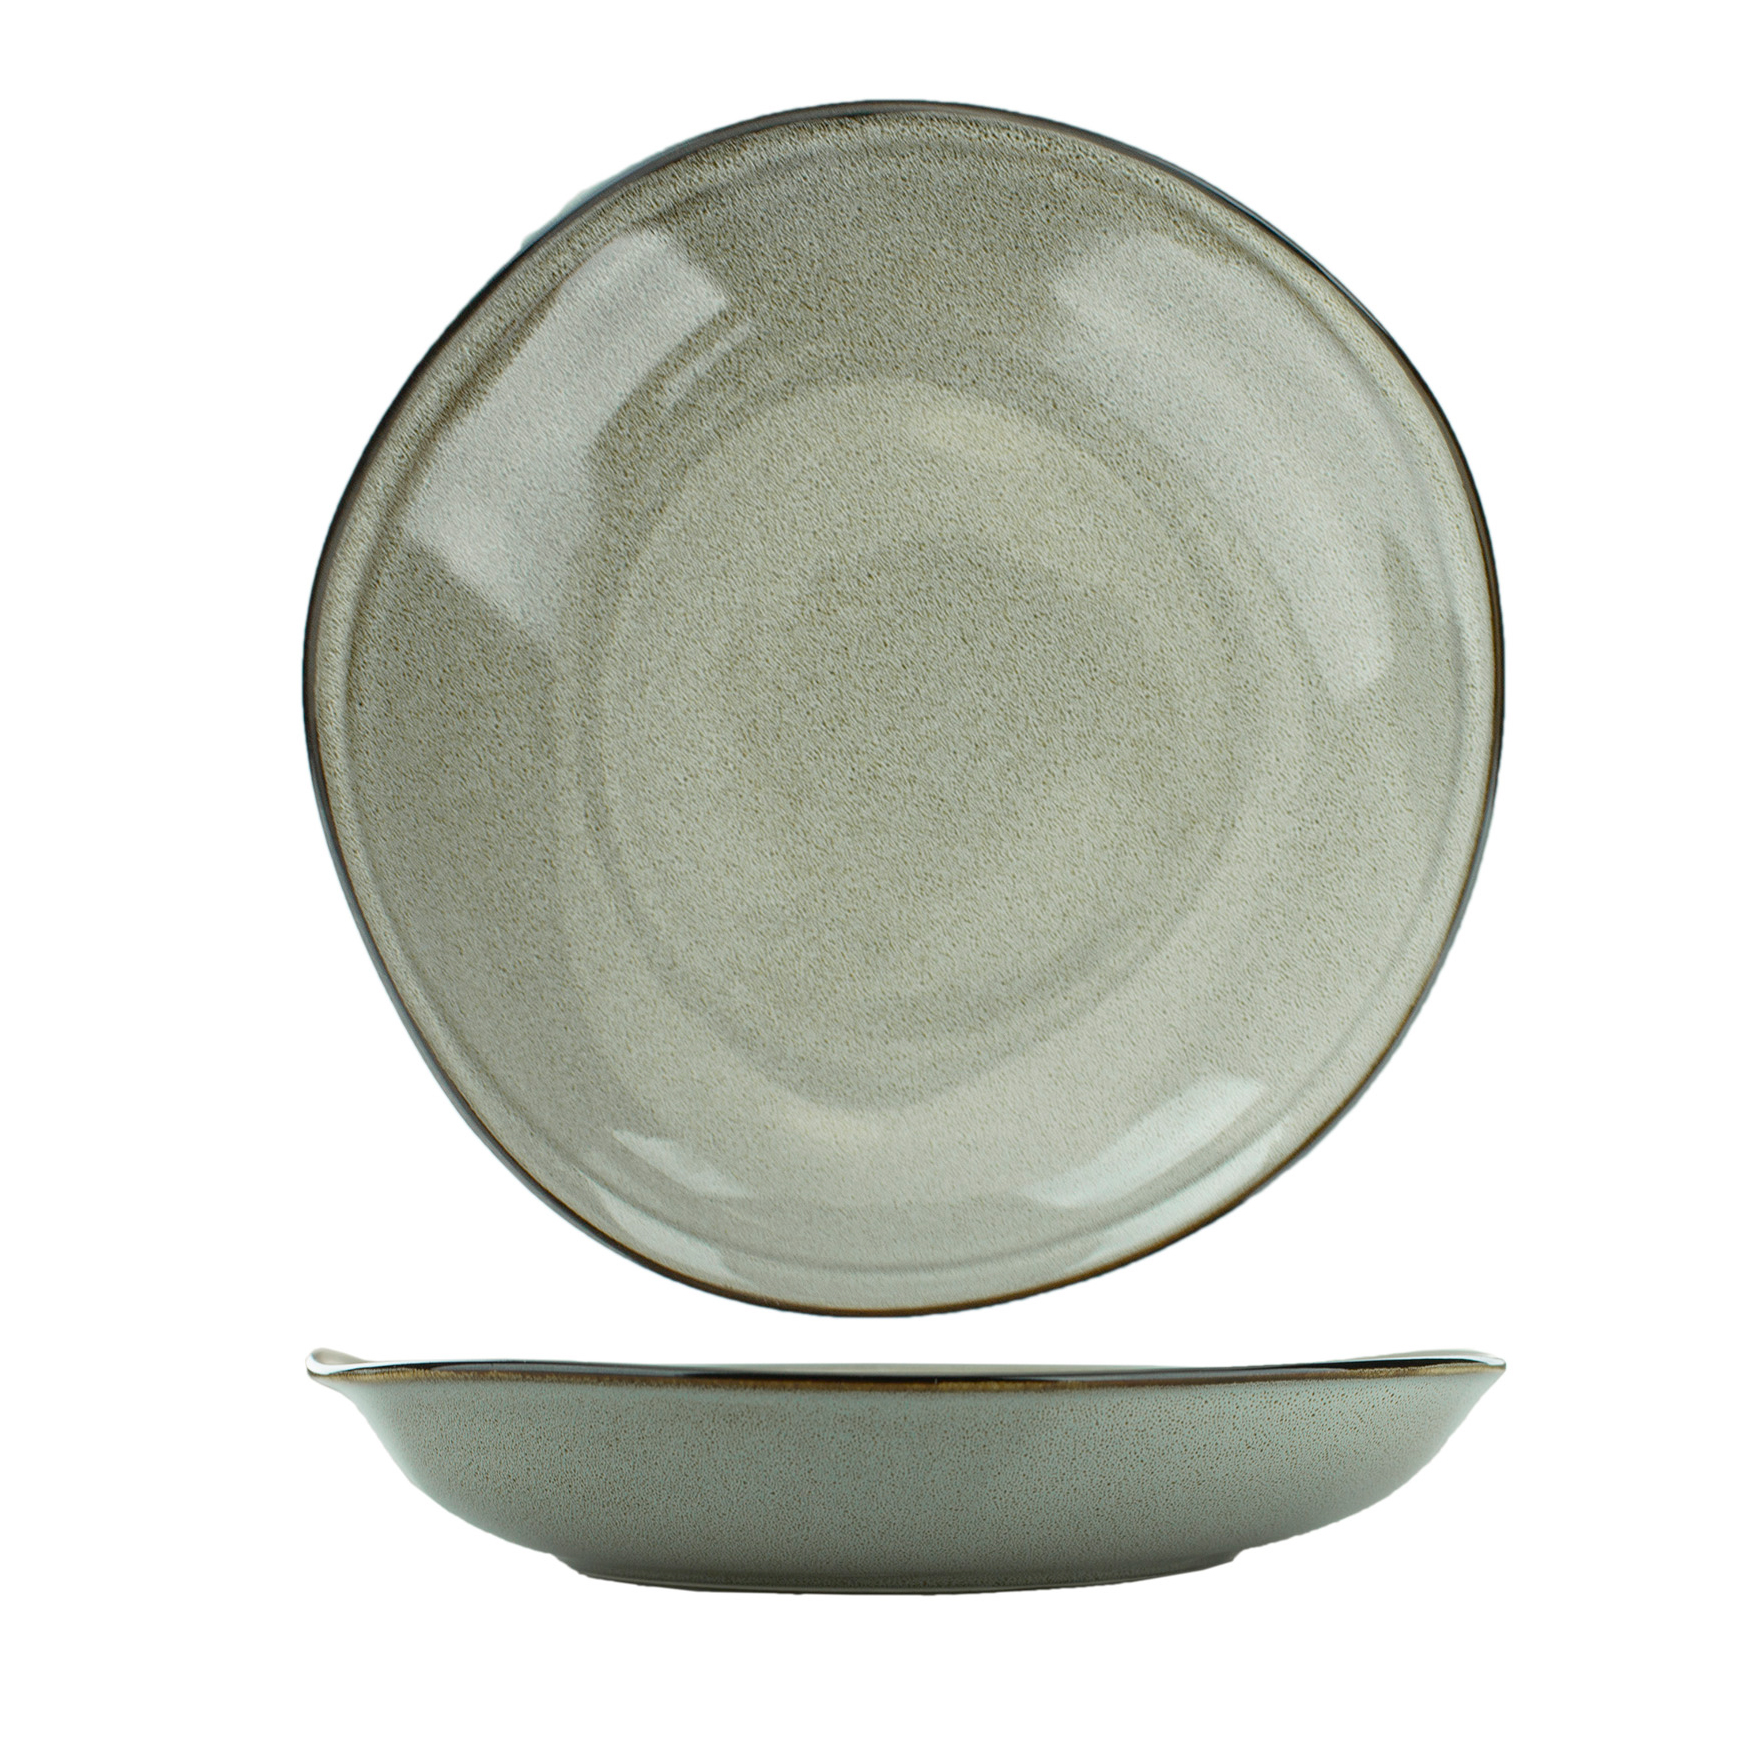 International Tableware LU-120-AS china, bowl, 33 - 64 oz